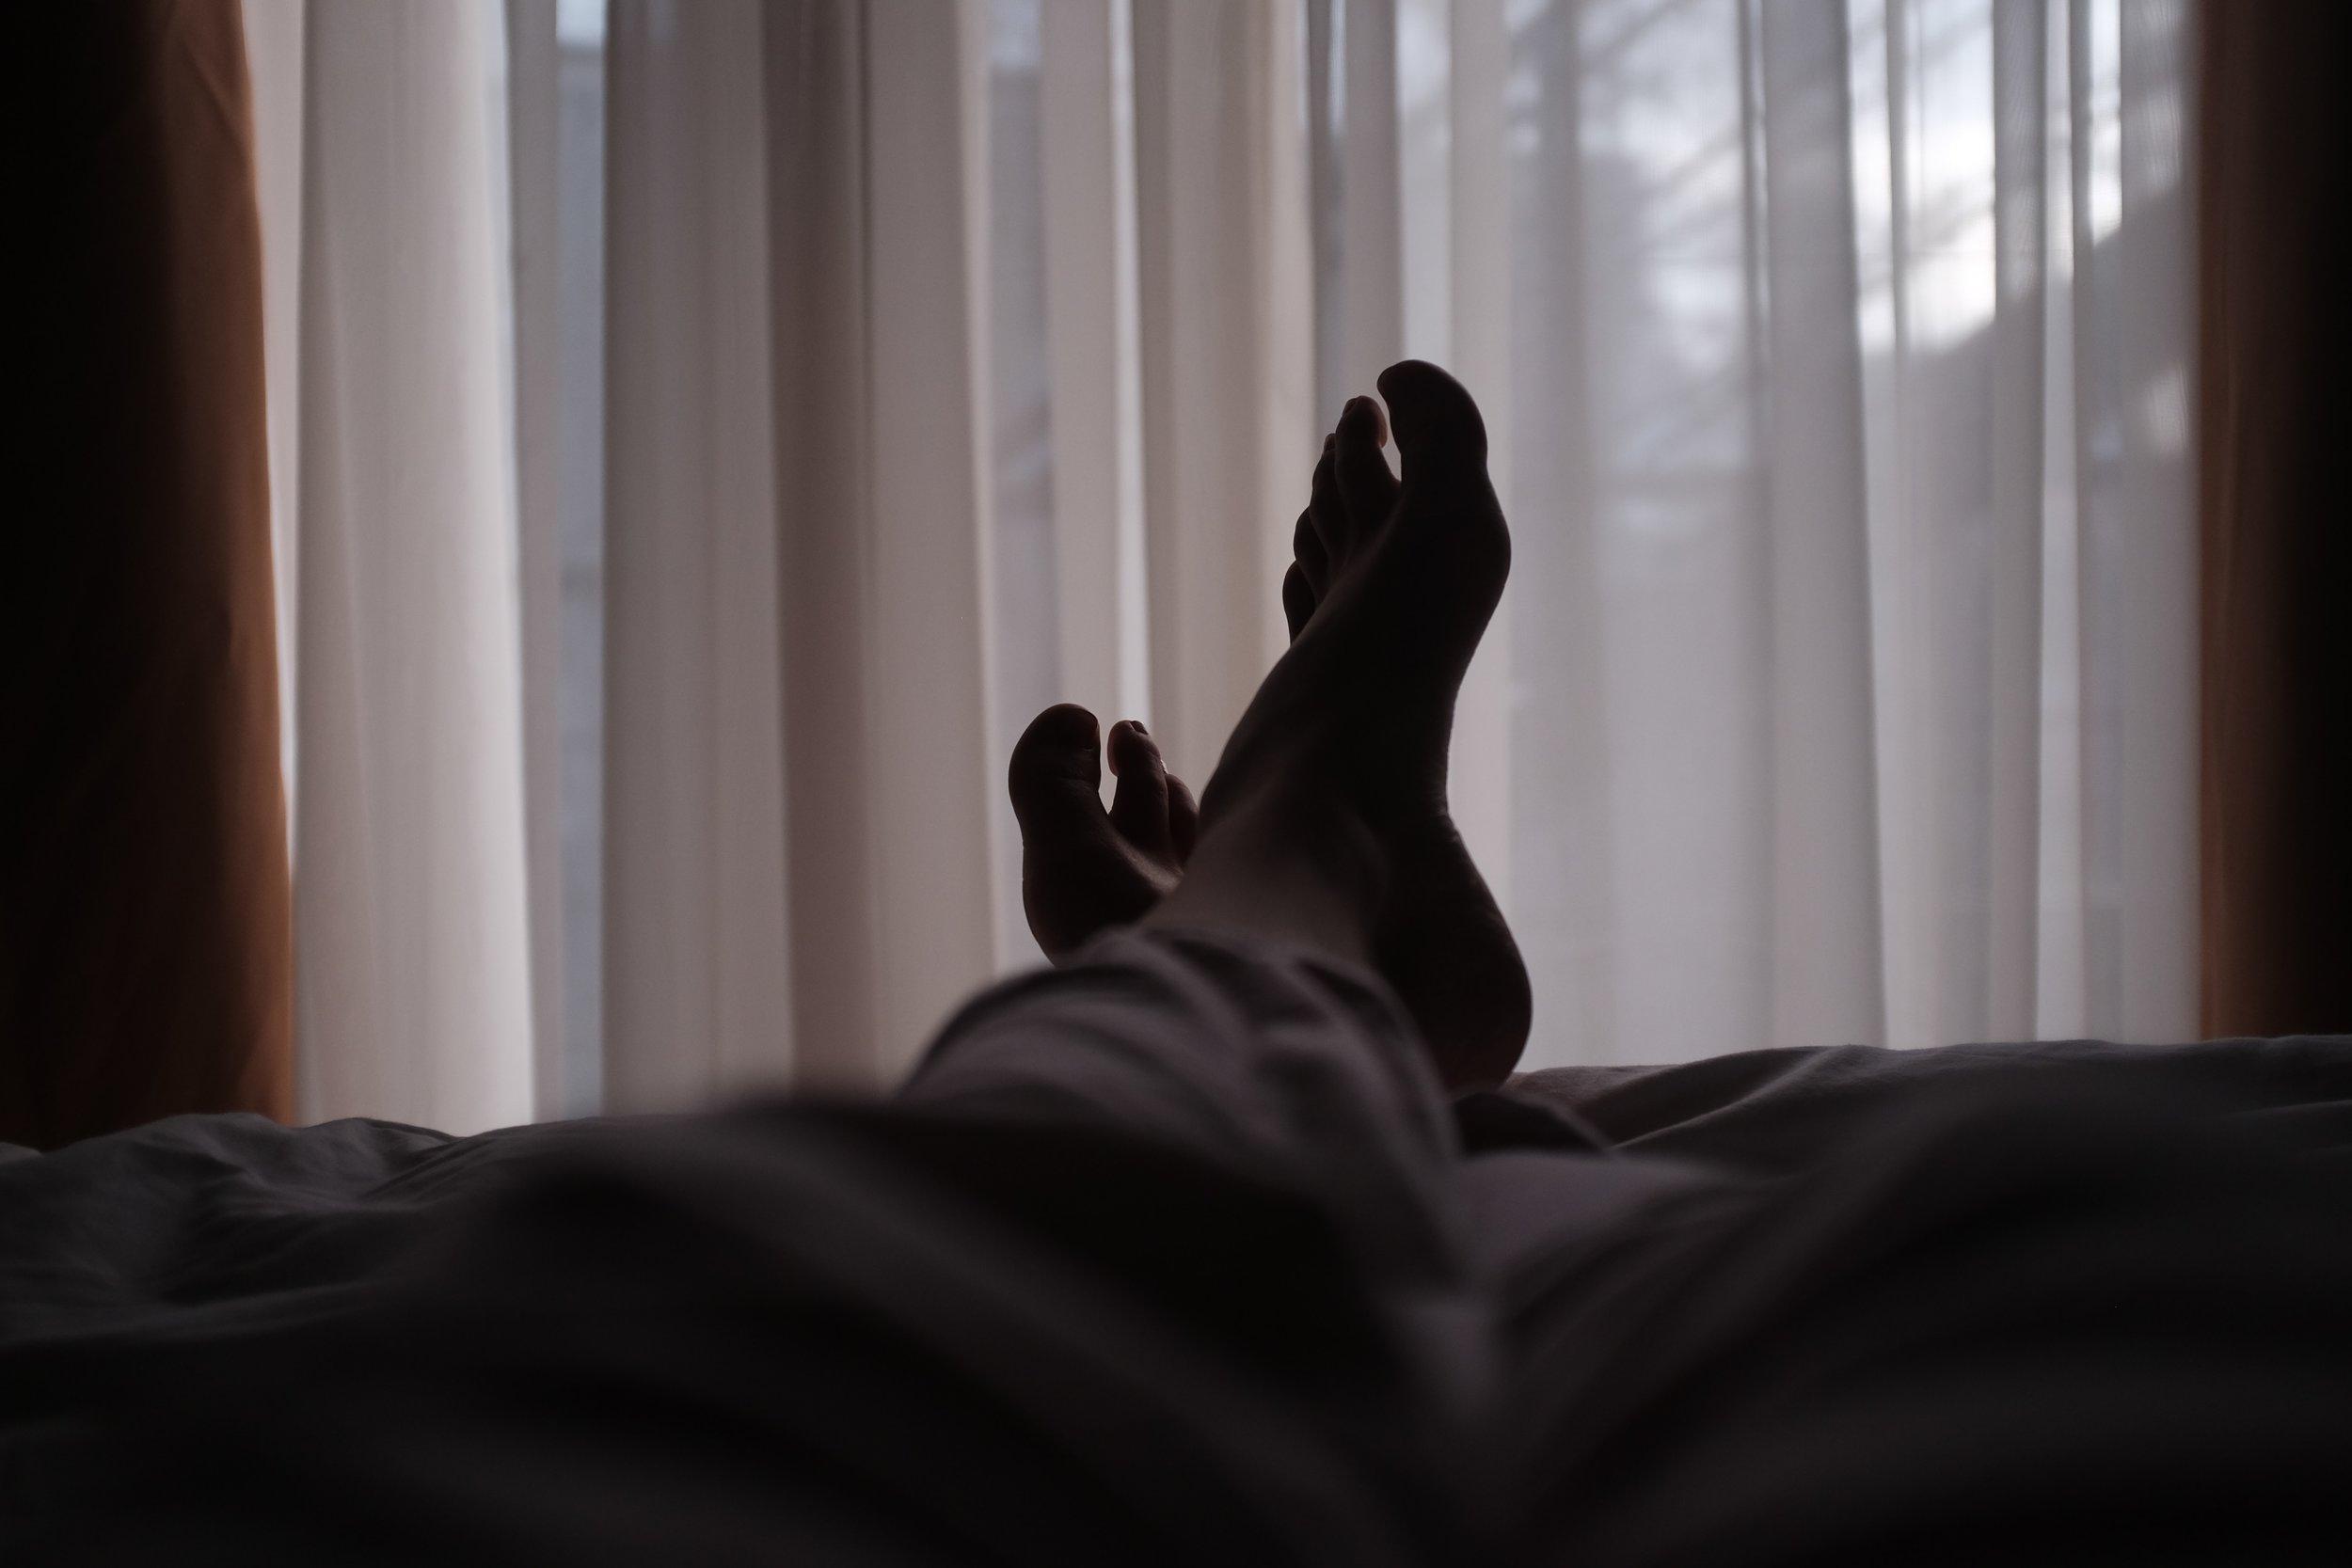 reasons for premature ejaculation in men